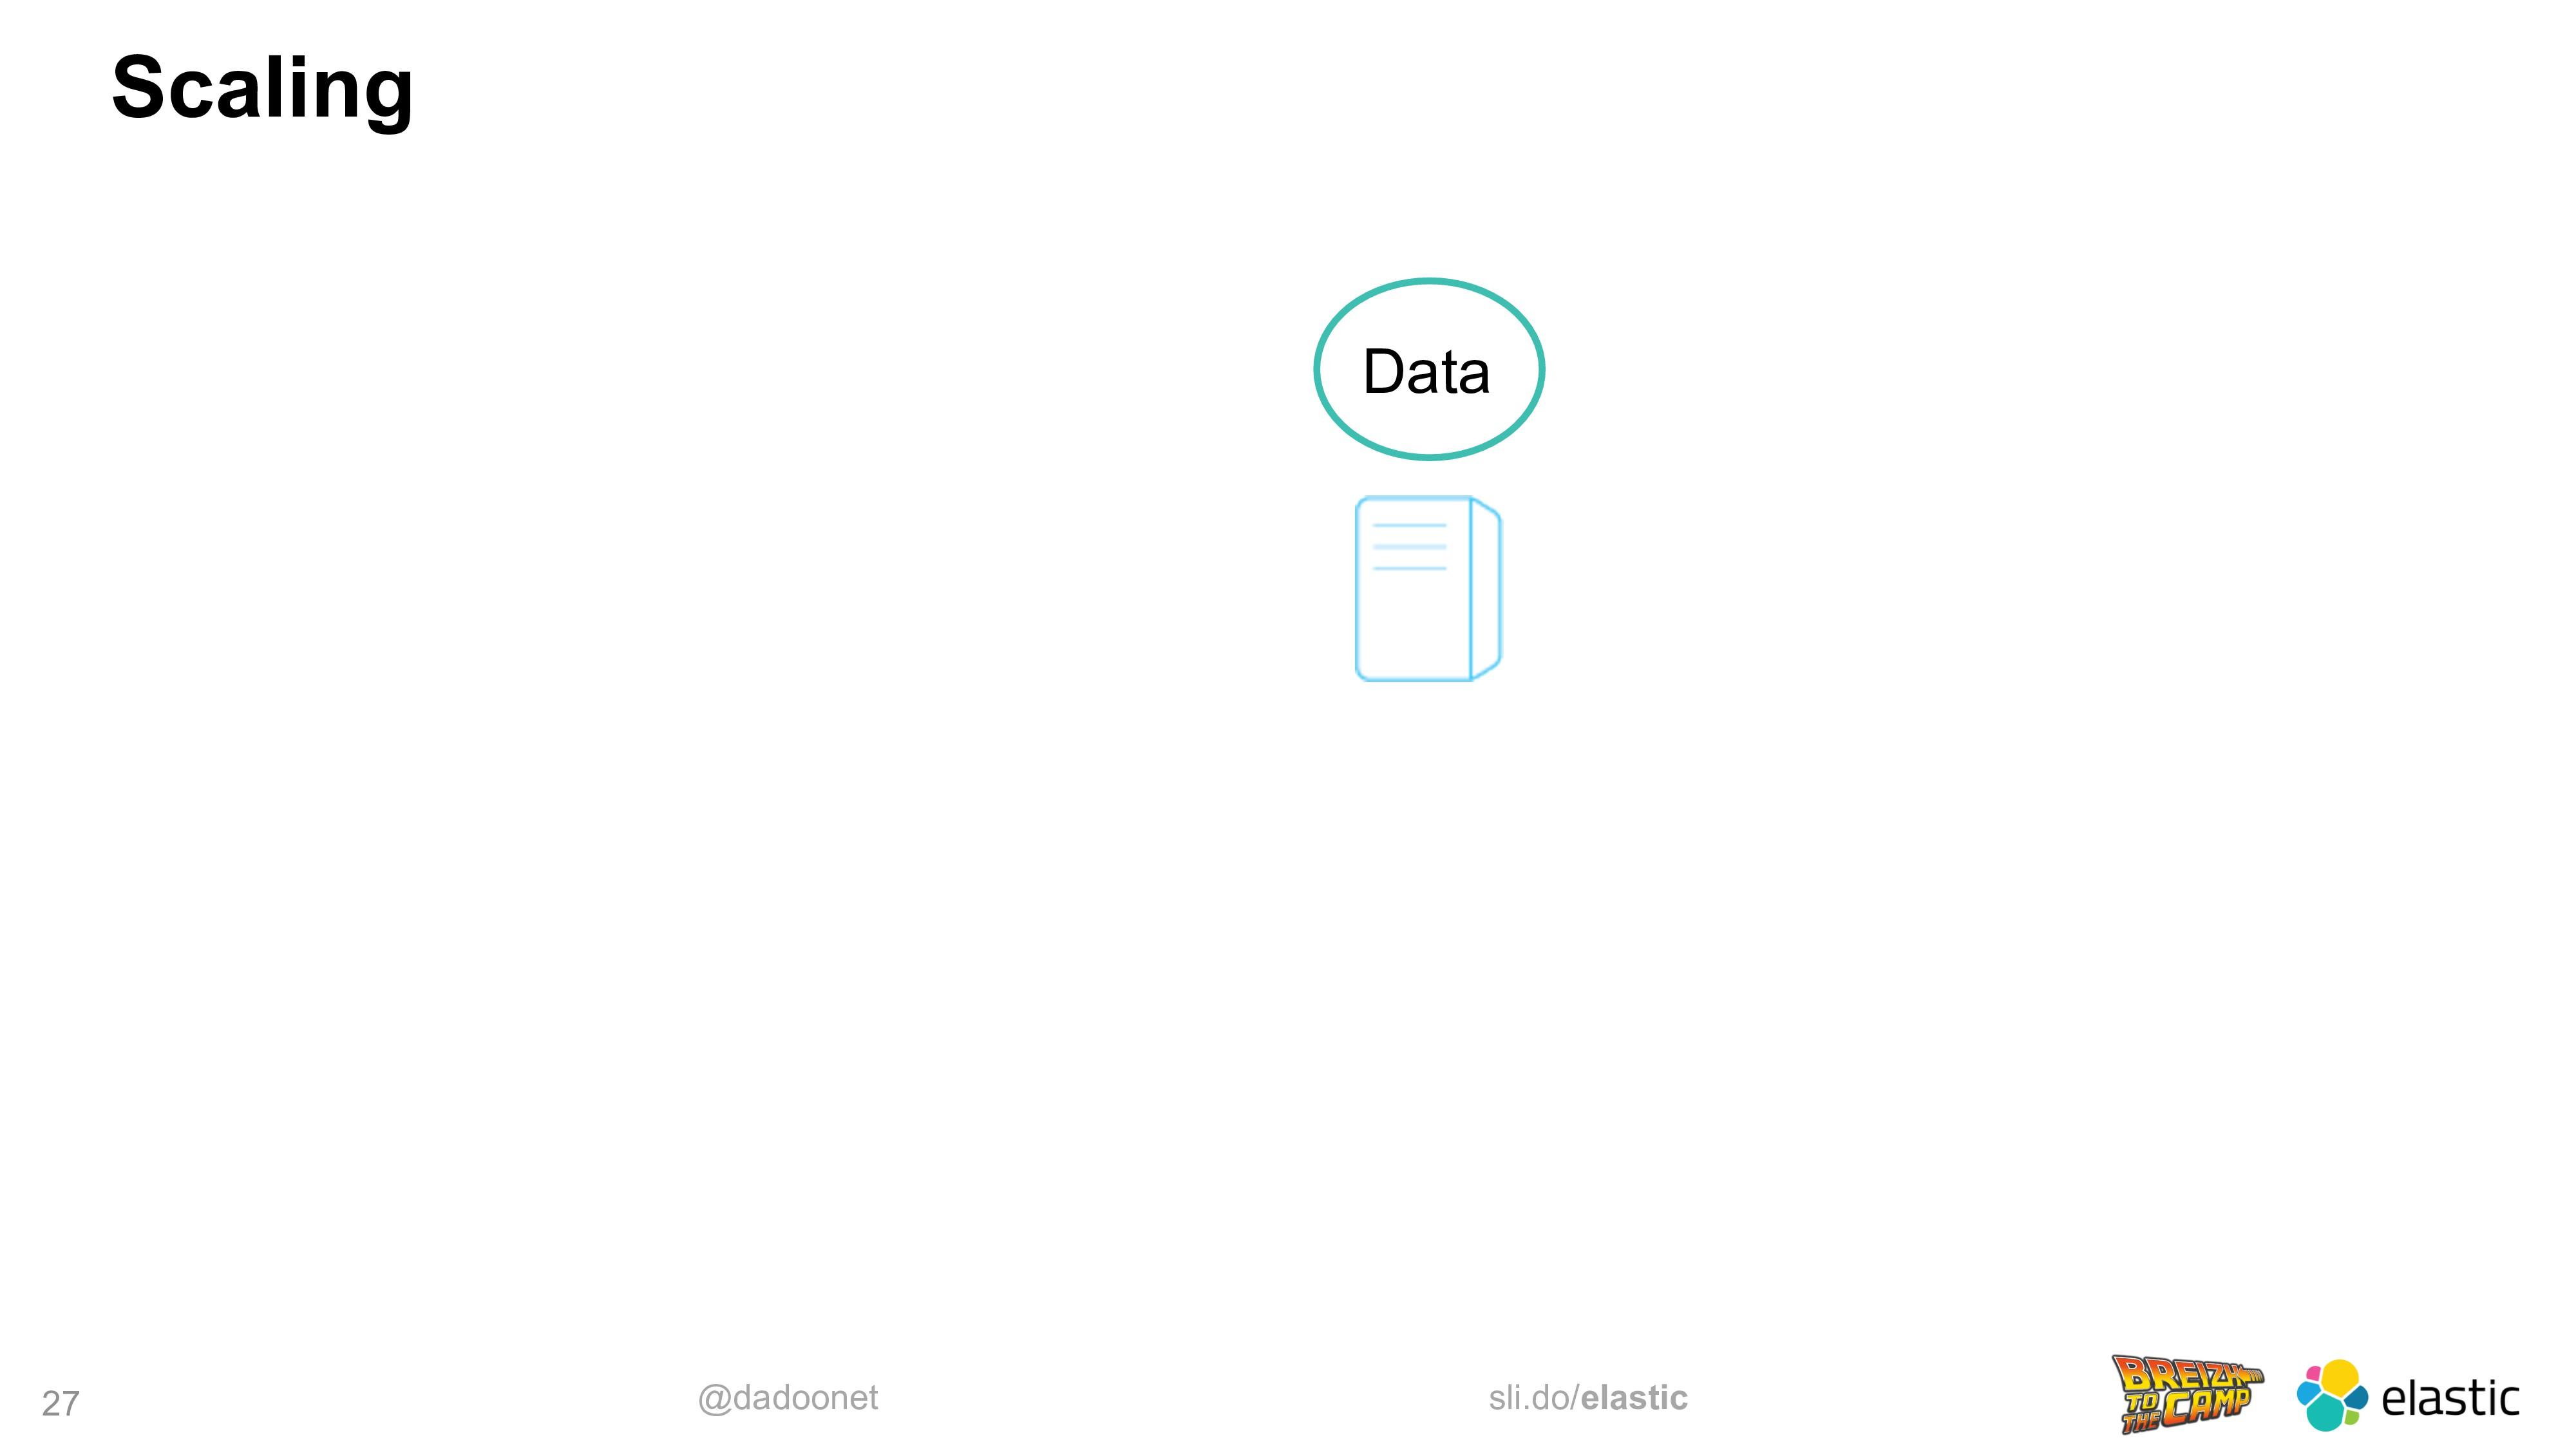 @dadoonet sli.do/elastic 27 Scaling Data